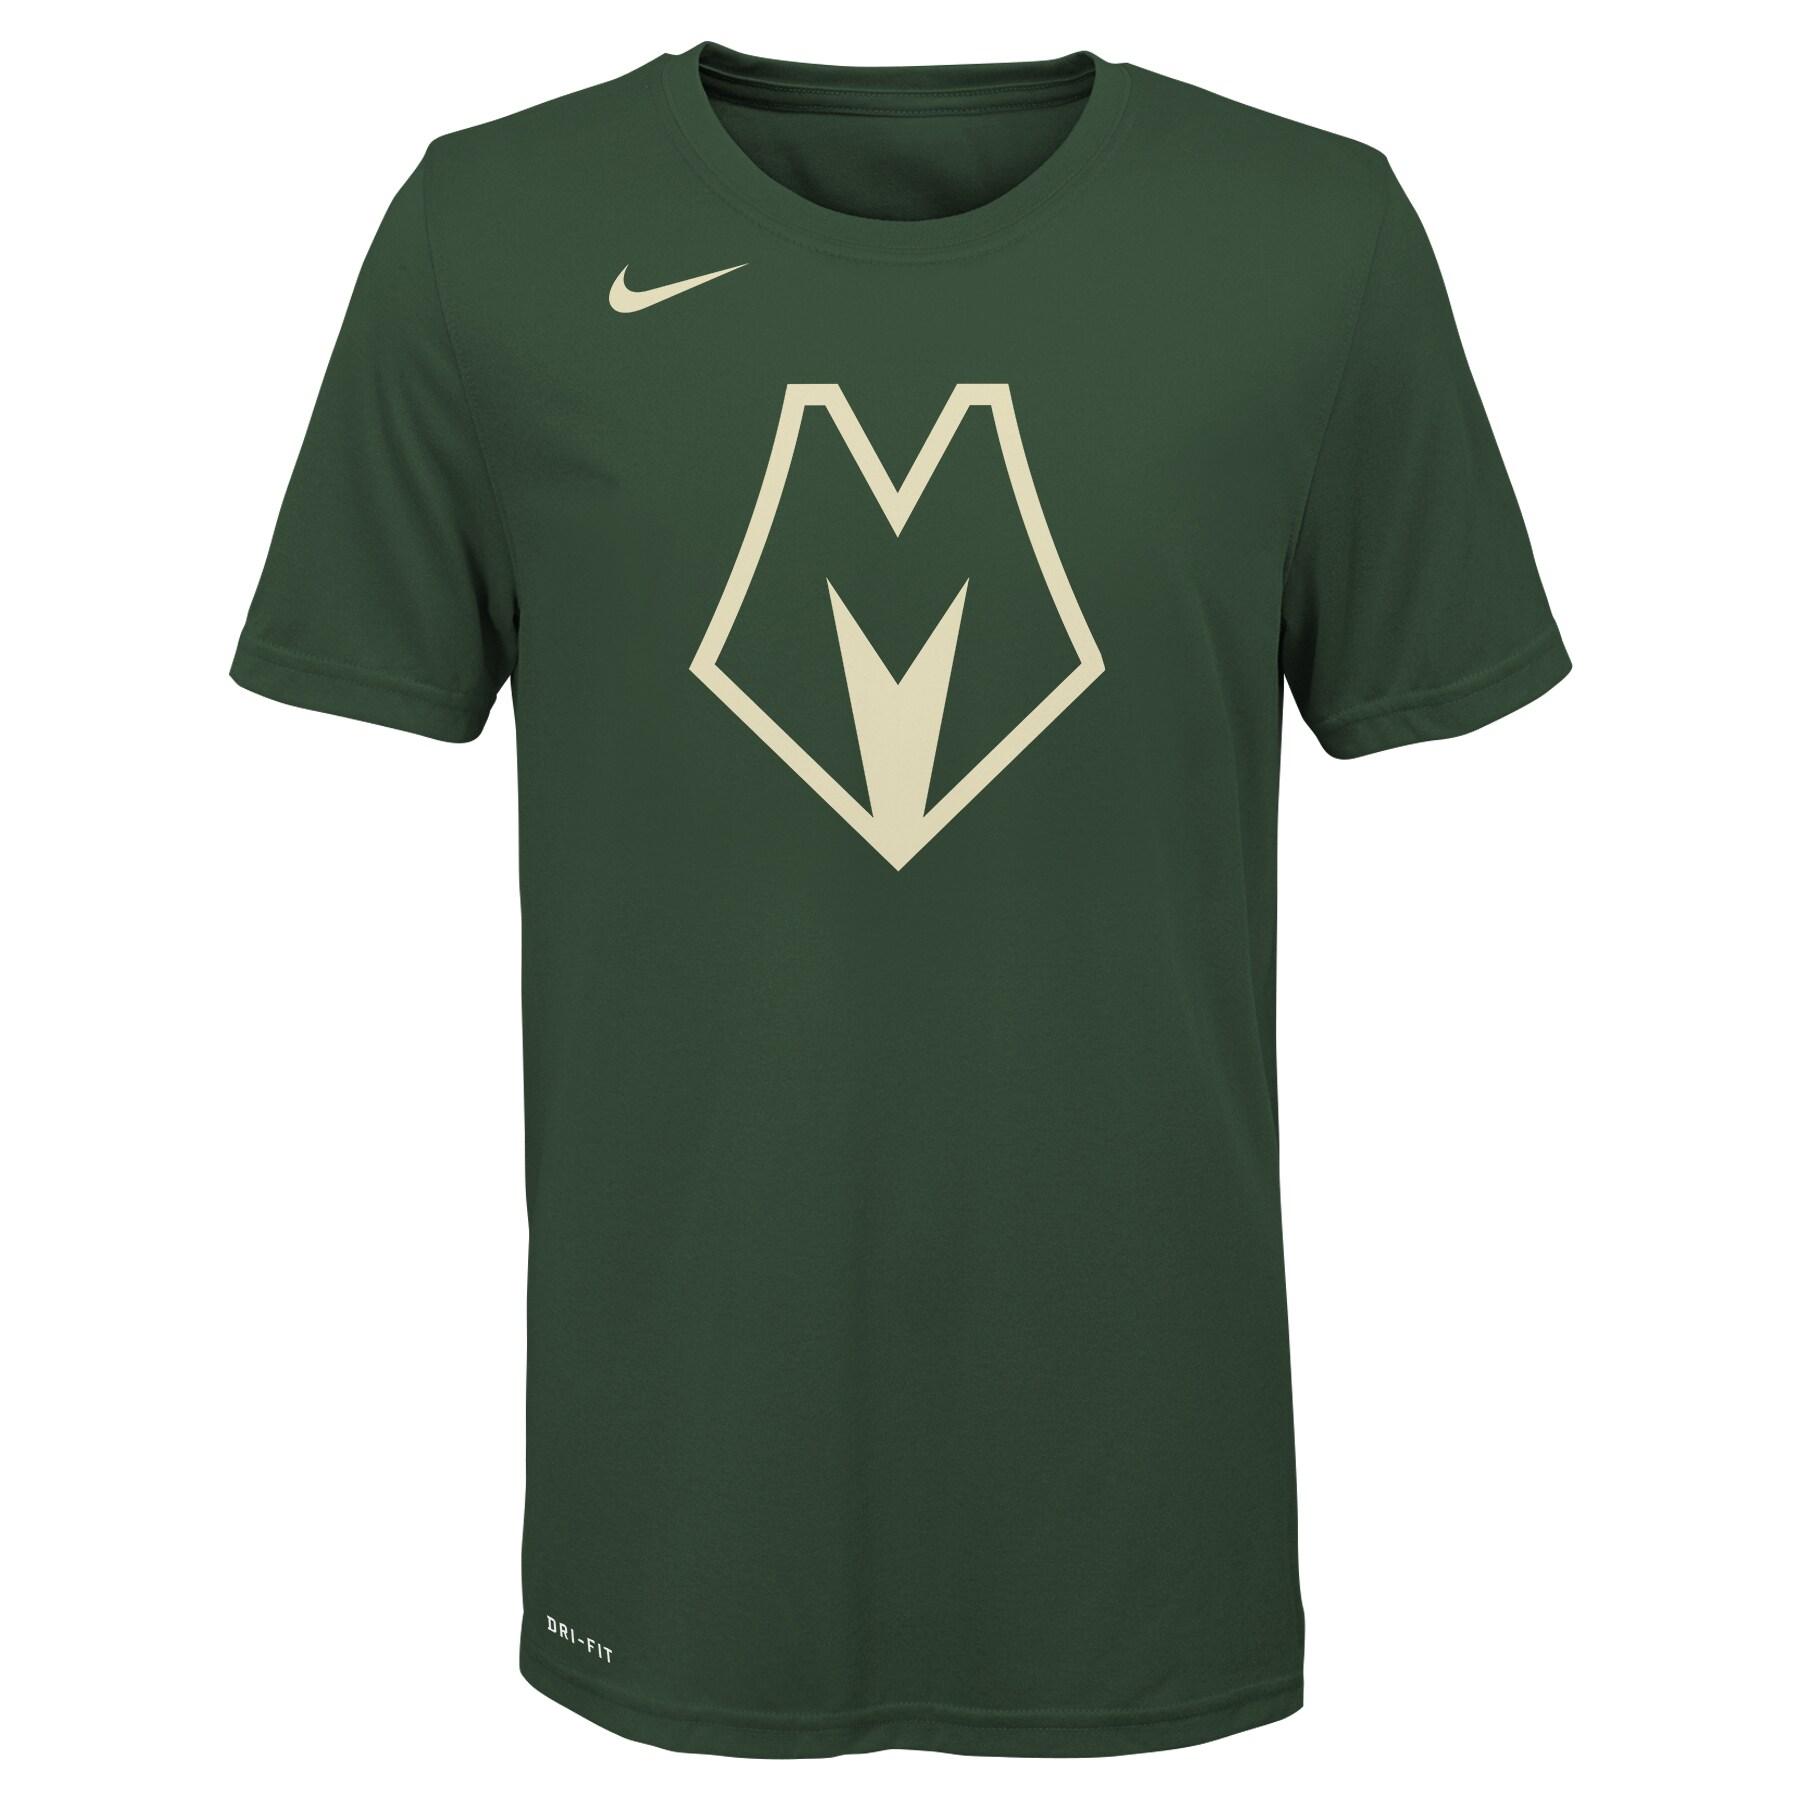 Milwaukee Bucks Nike Youth 2019/20 City Edition Logo T-Shirt - Green